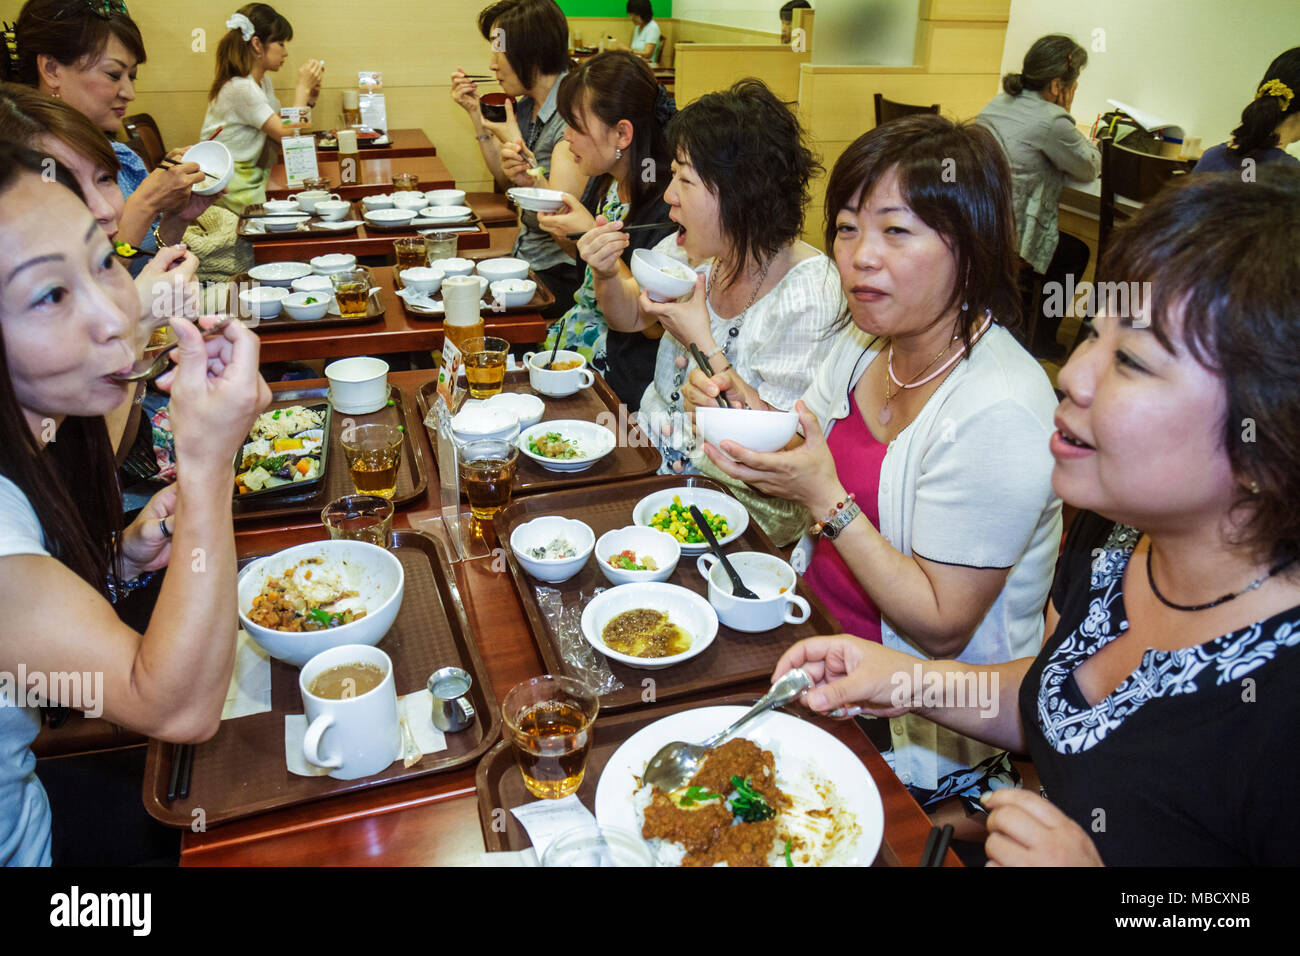 Tokyo Japan Shinjuku Shinjuku NS Building Restaurant Büro Arbeiter Asiatin Frauen Kollegen Essen, Essen Stockbild